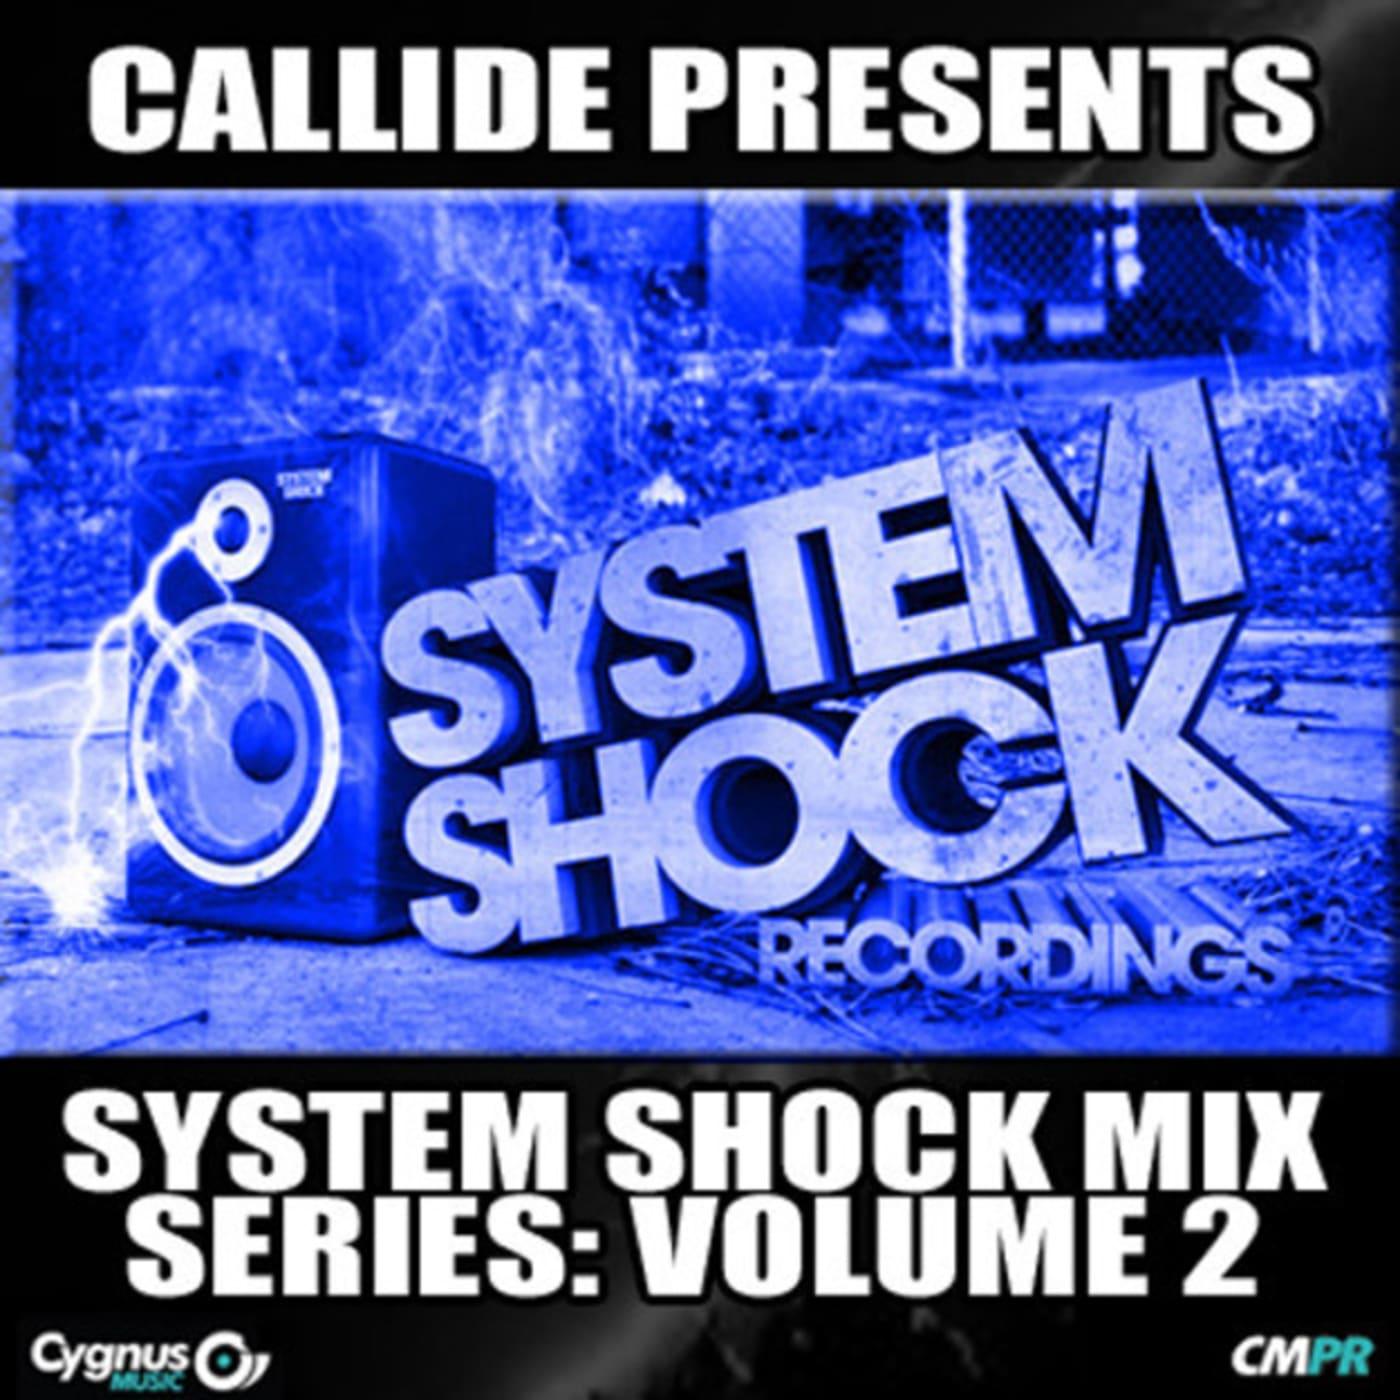 system shock mix series vol 2